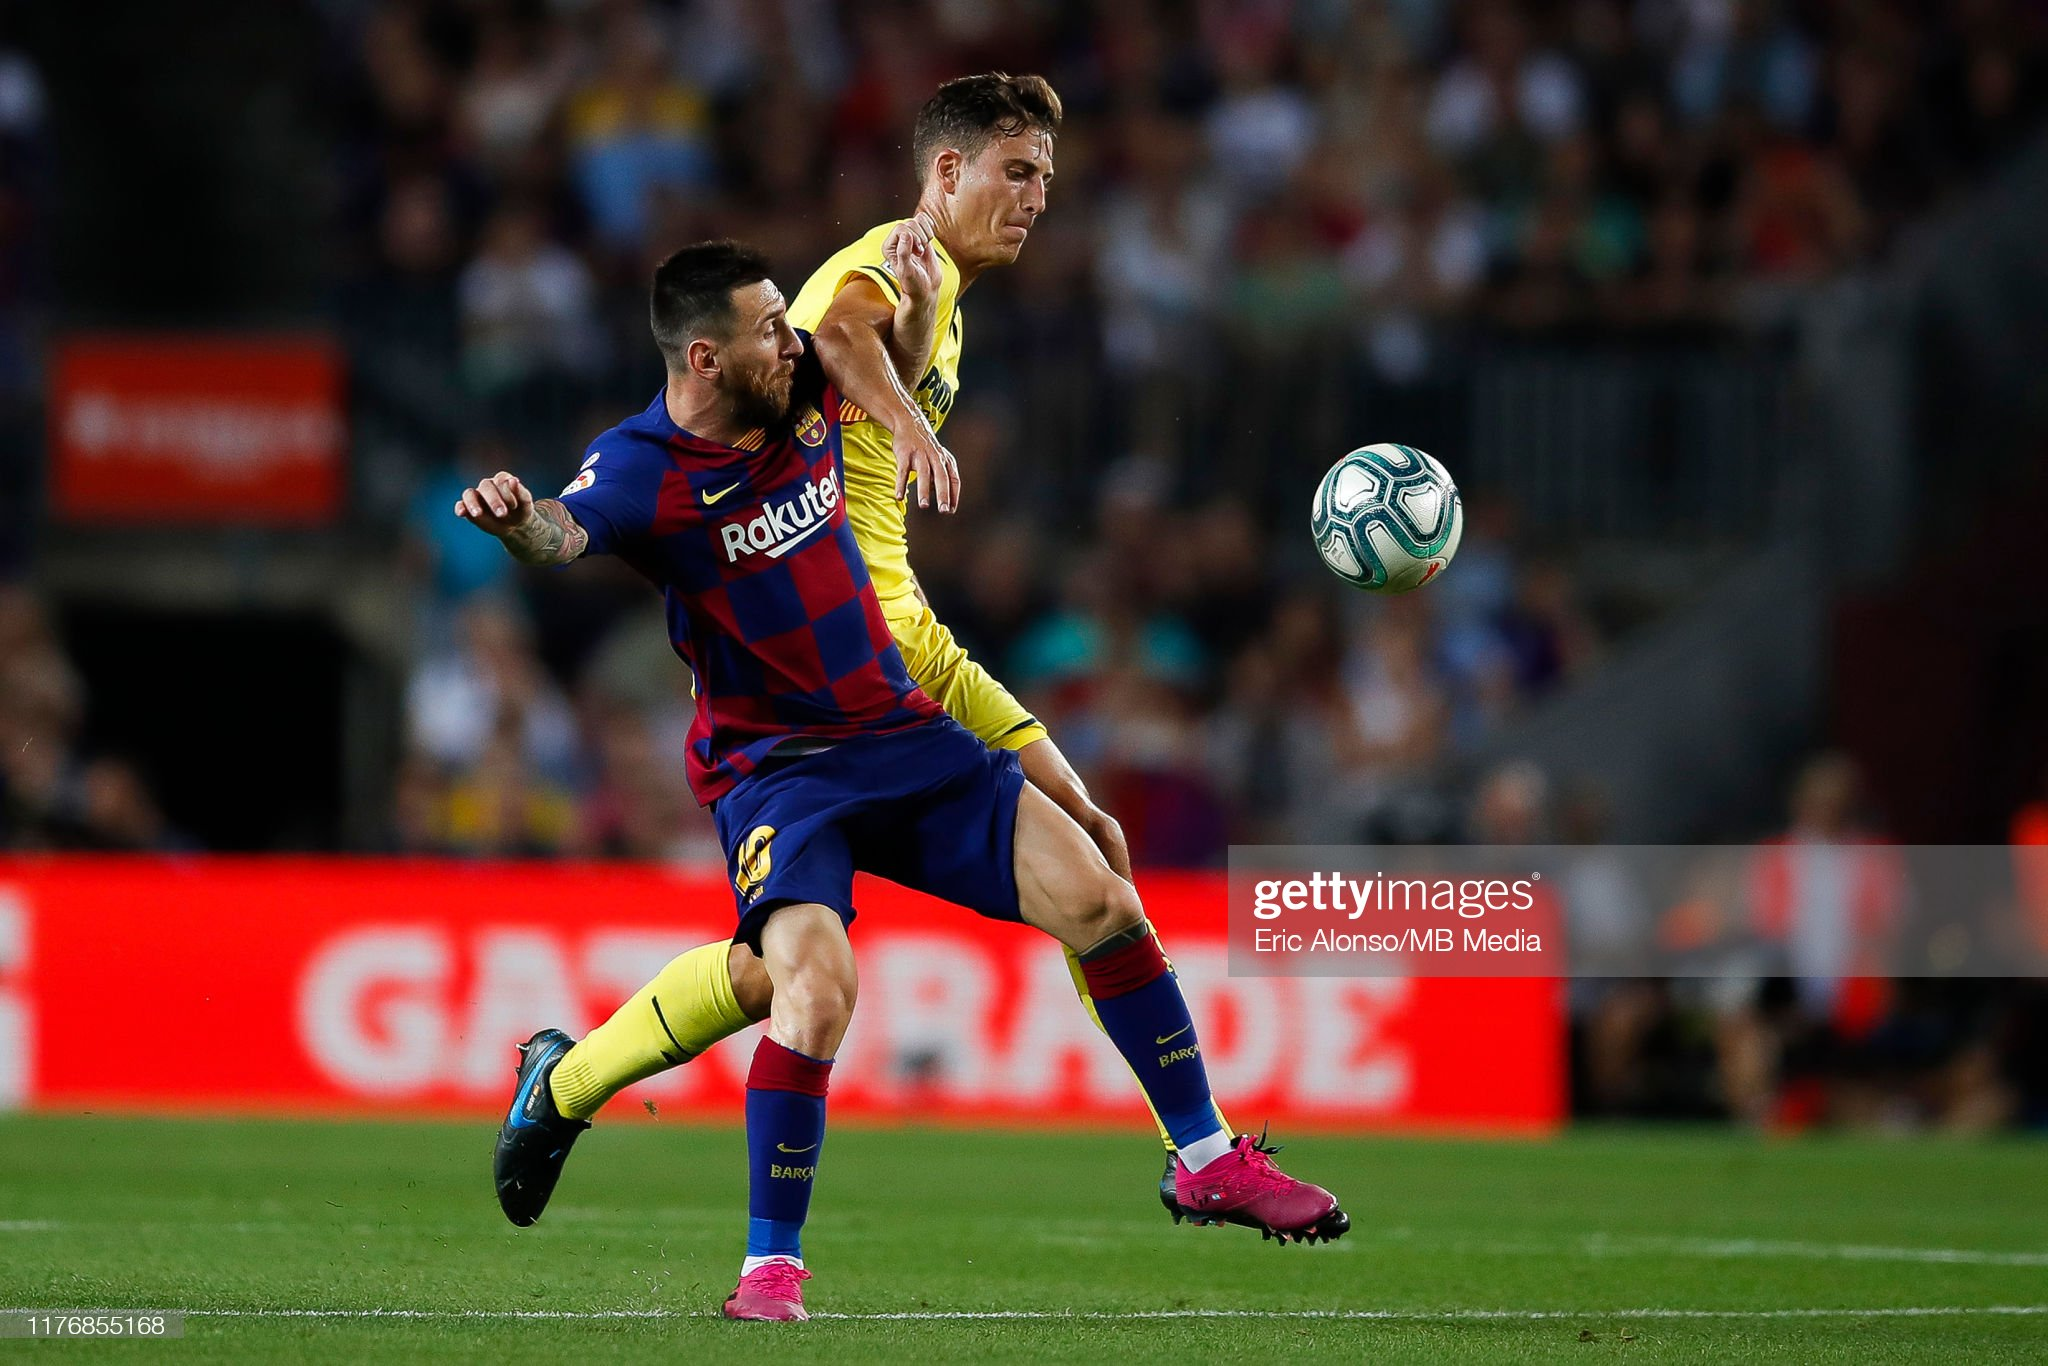 صور مباراة : برشلونة - فياريال 2-1 ( 24-09-2019 )  Lionel-messi-of-fc-barcelona-fight-for-the-ball-against-pau-torres-of-picture-id1176855168?s=2048x2048